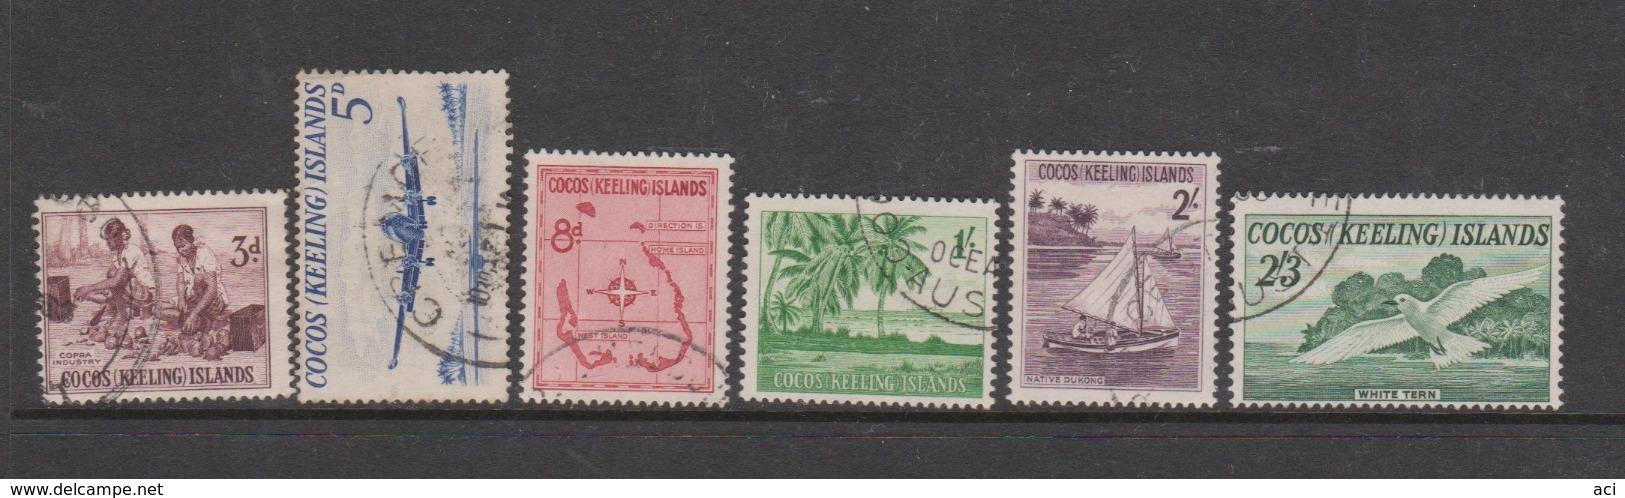 Cocos Keeling Islands SG 1-6 1963 Definitives,used, - Cocos (Keeling) Islands